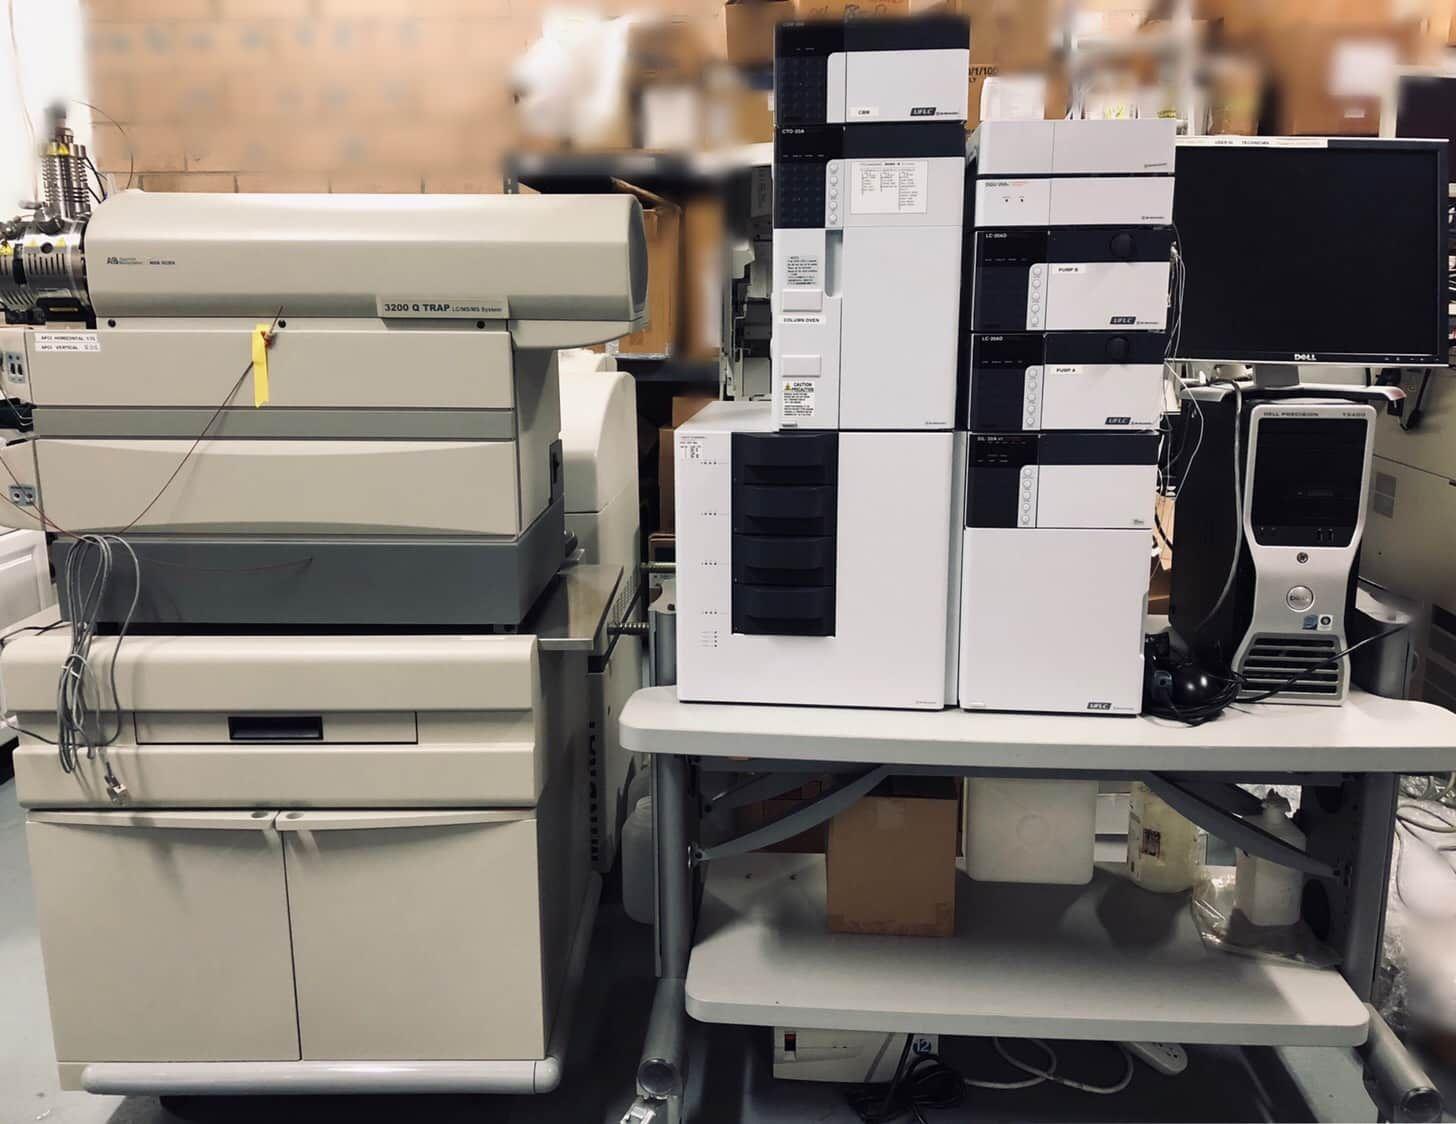 AB Sciex Q Trap 3200 LC-MS/MS System W/ Shimadzu Prominence UFLC , HPLC Complete System